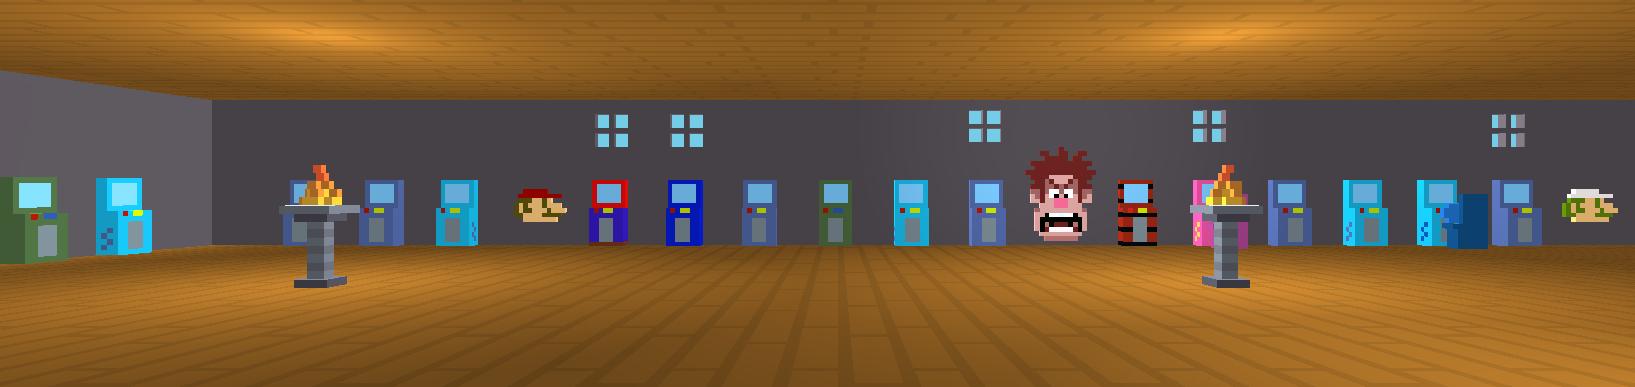 Vloxelworld arcade 0 6